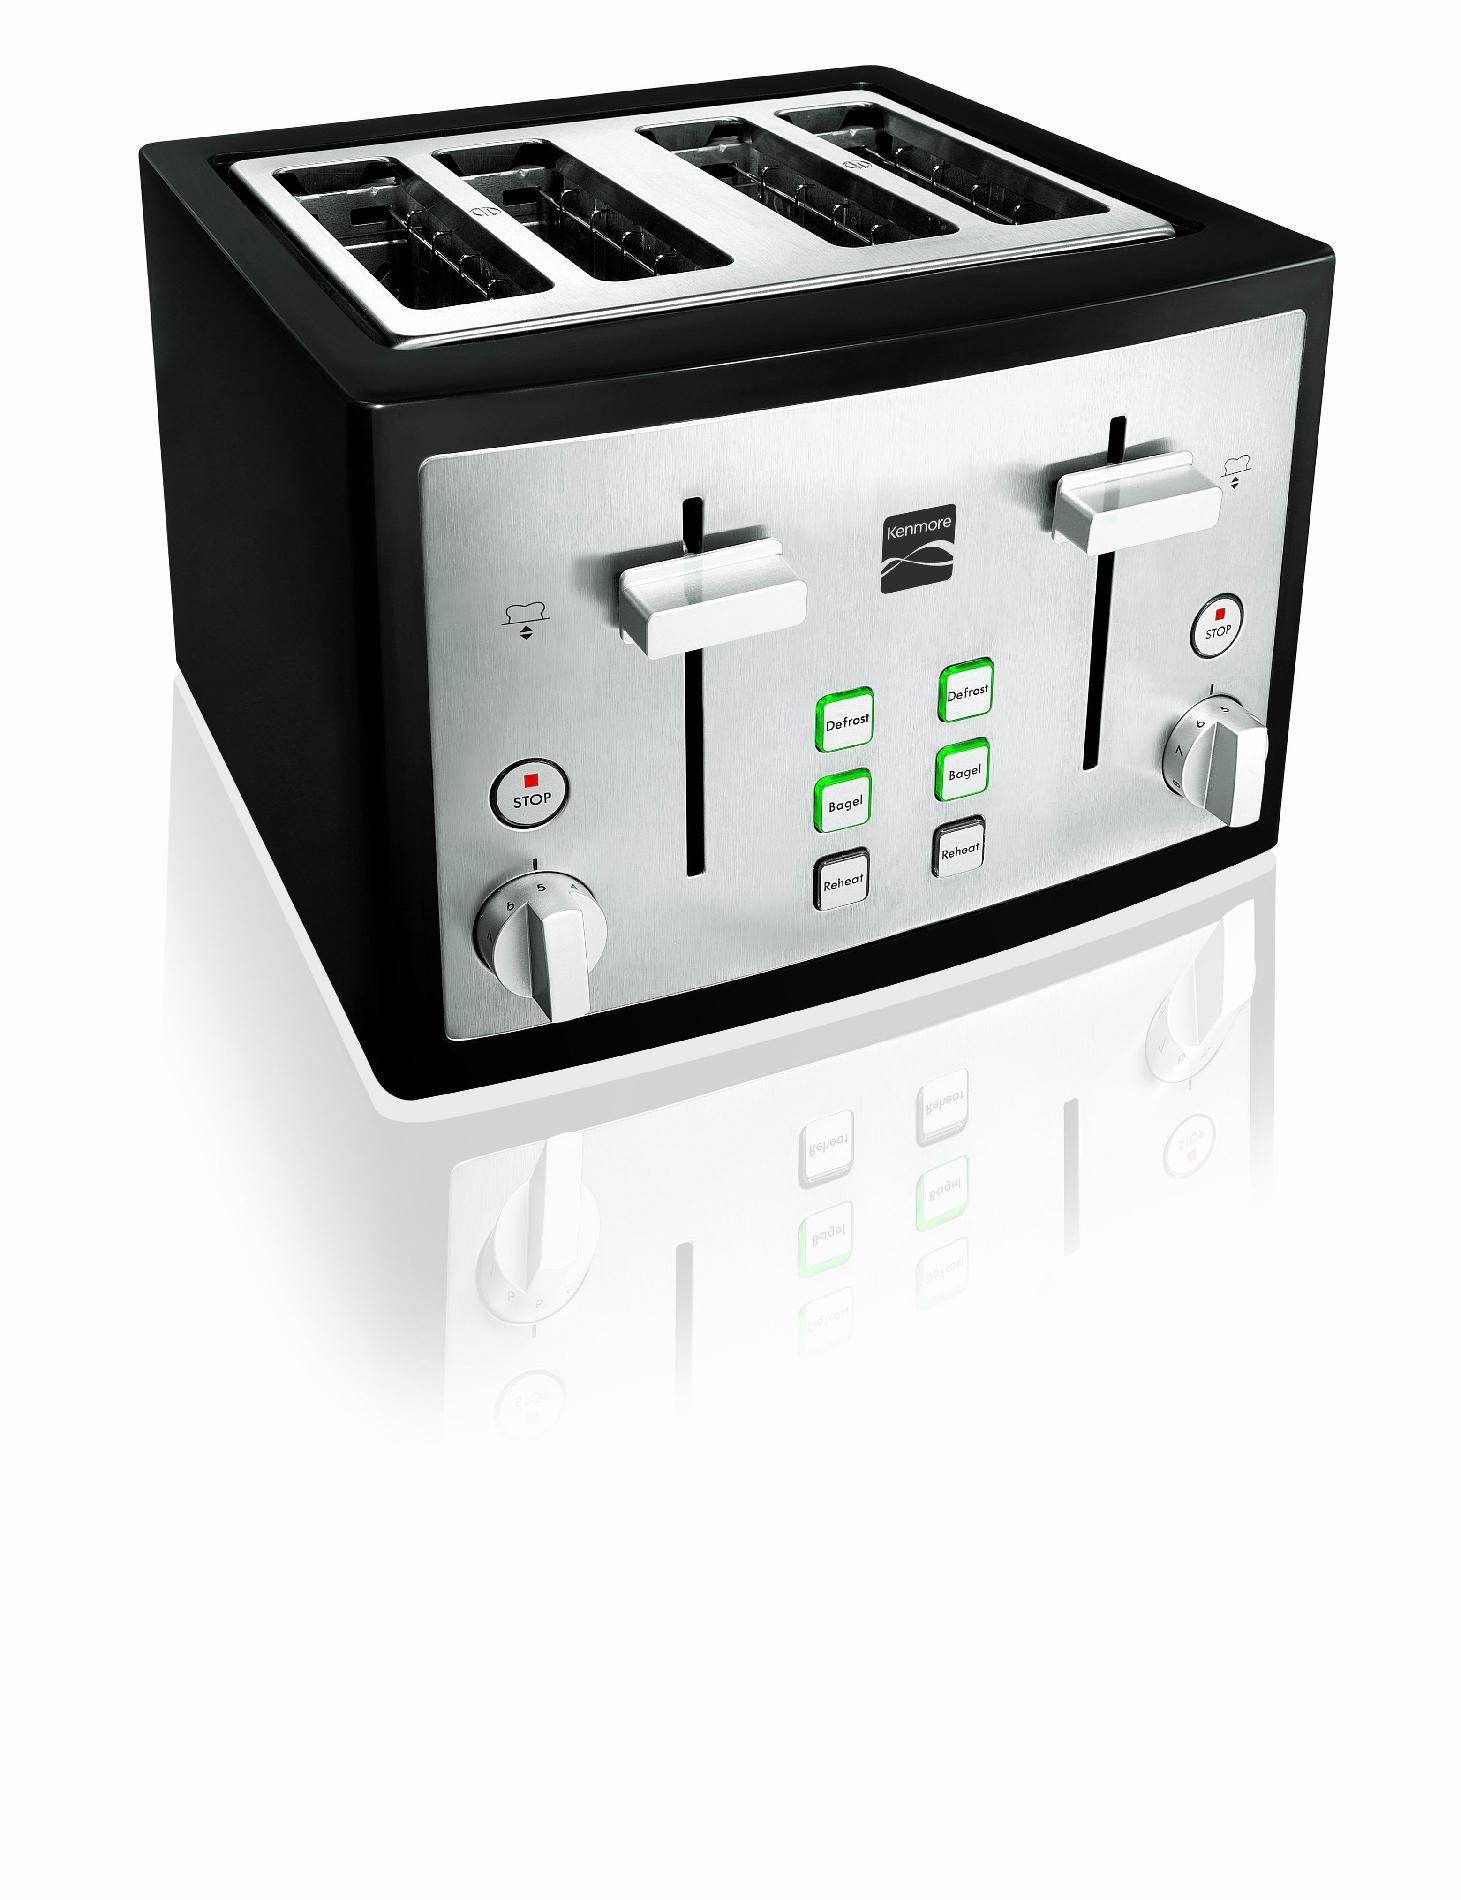 Kenmore 4-Slice Toaster, Black